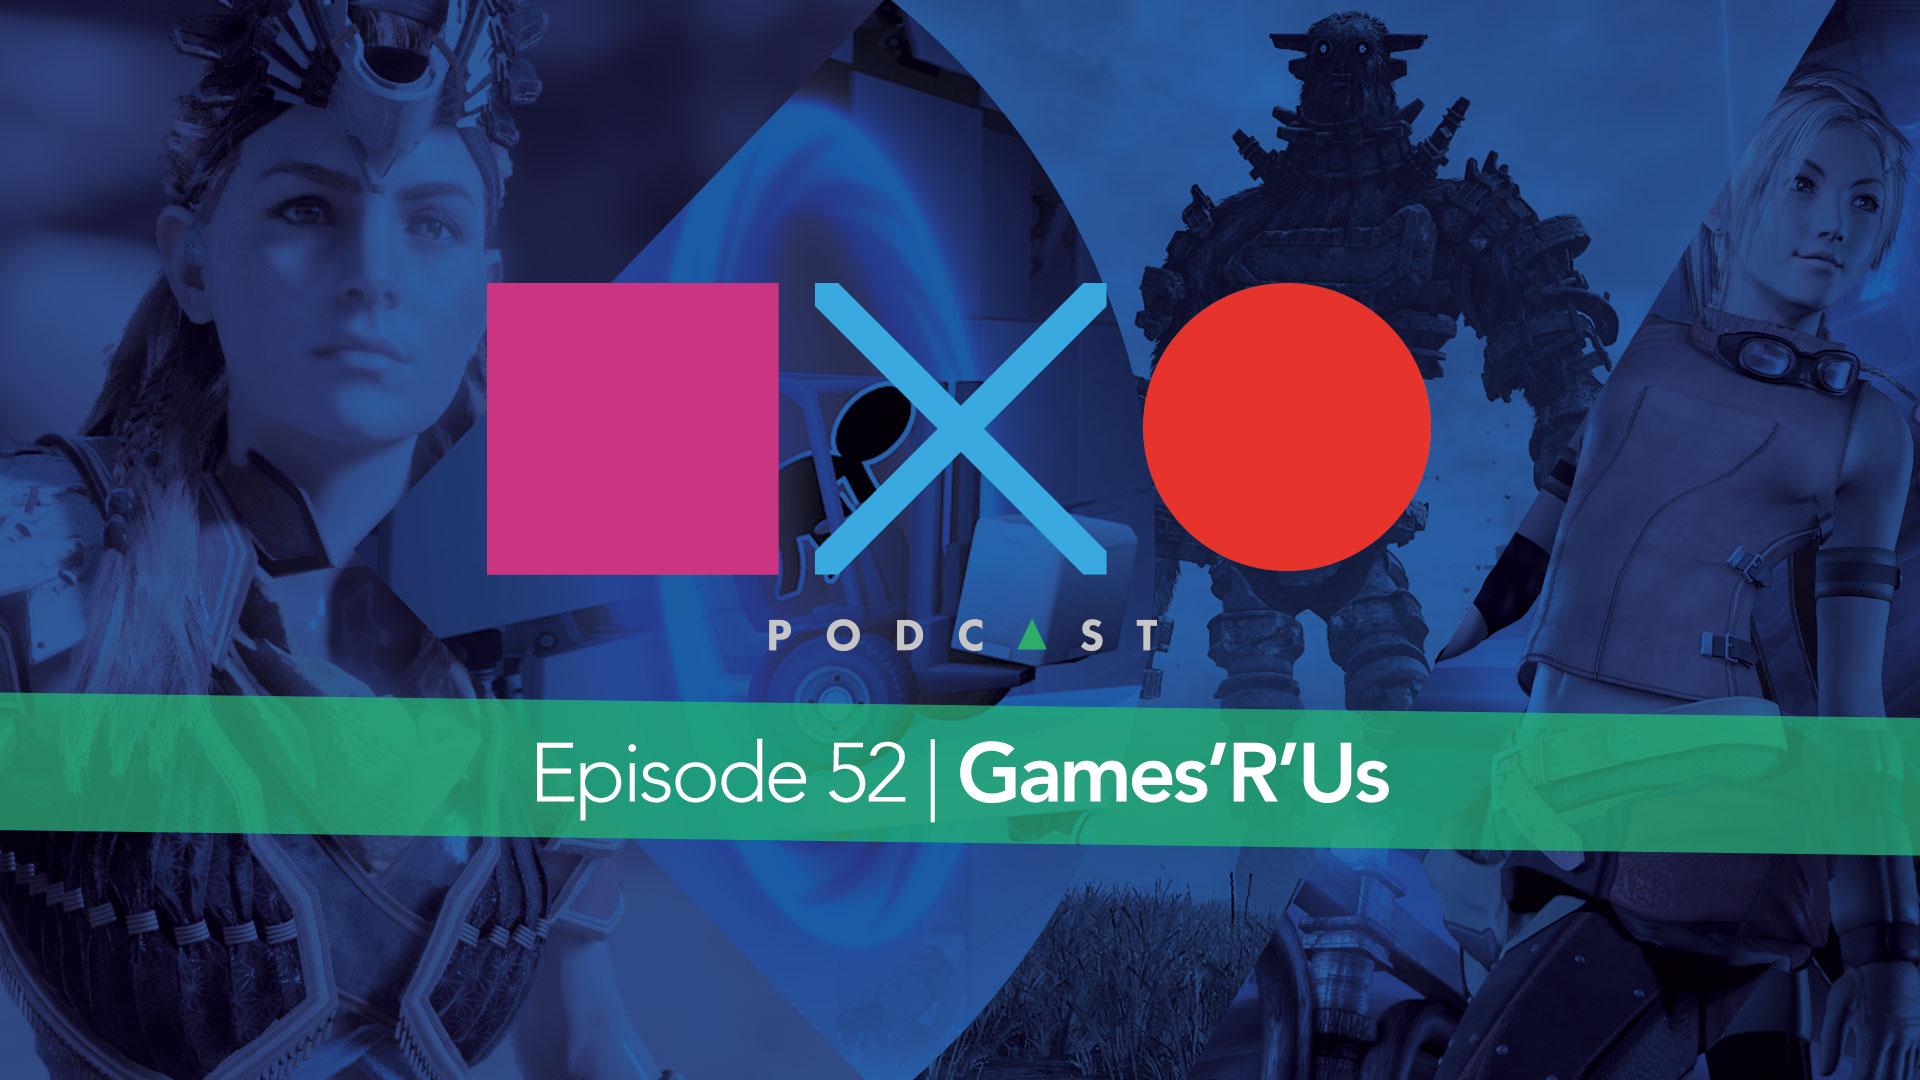 Episode 52 | Games'R'Us